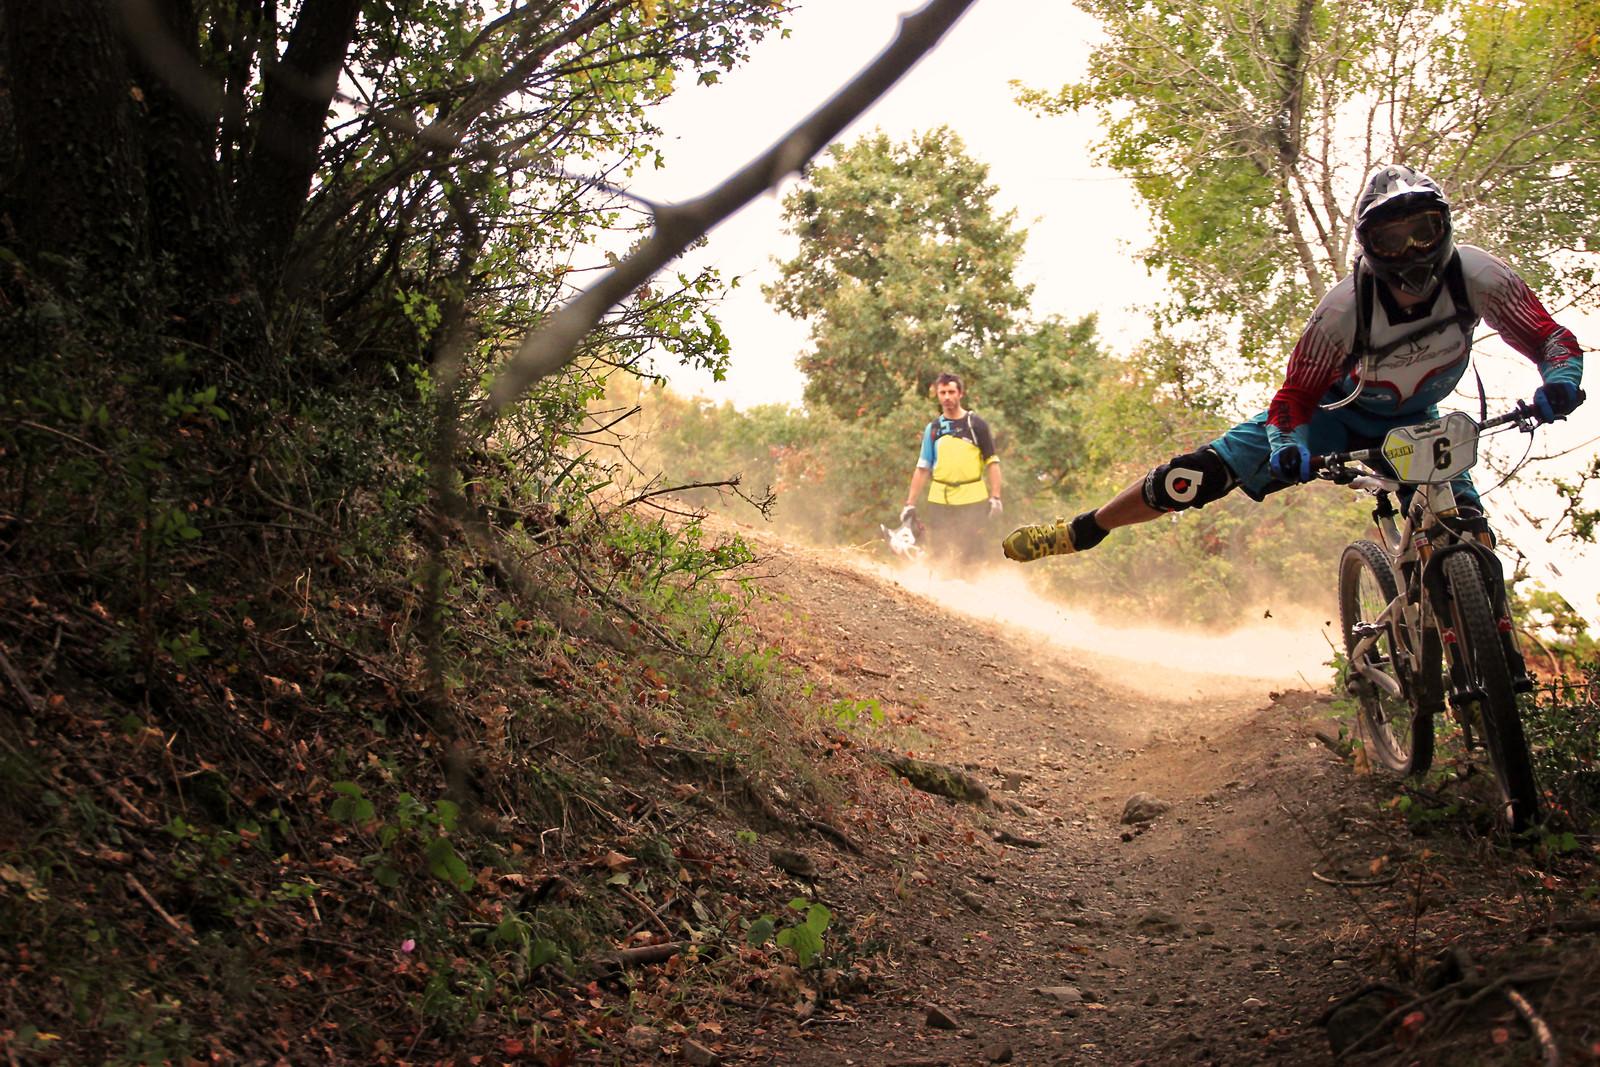 Super Enduro Tolfa 01 - Ruggero - Mountain Biking Pictures - Vital MTB